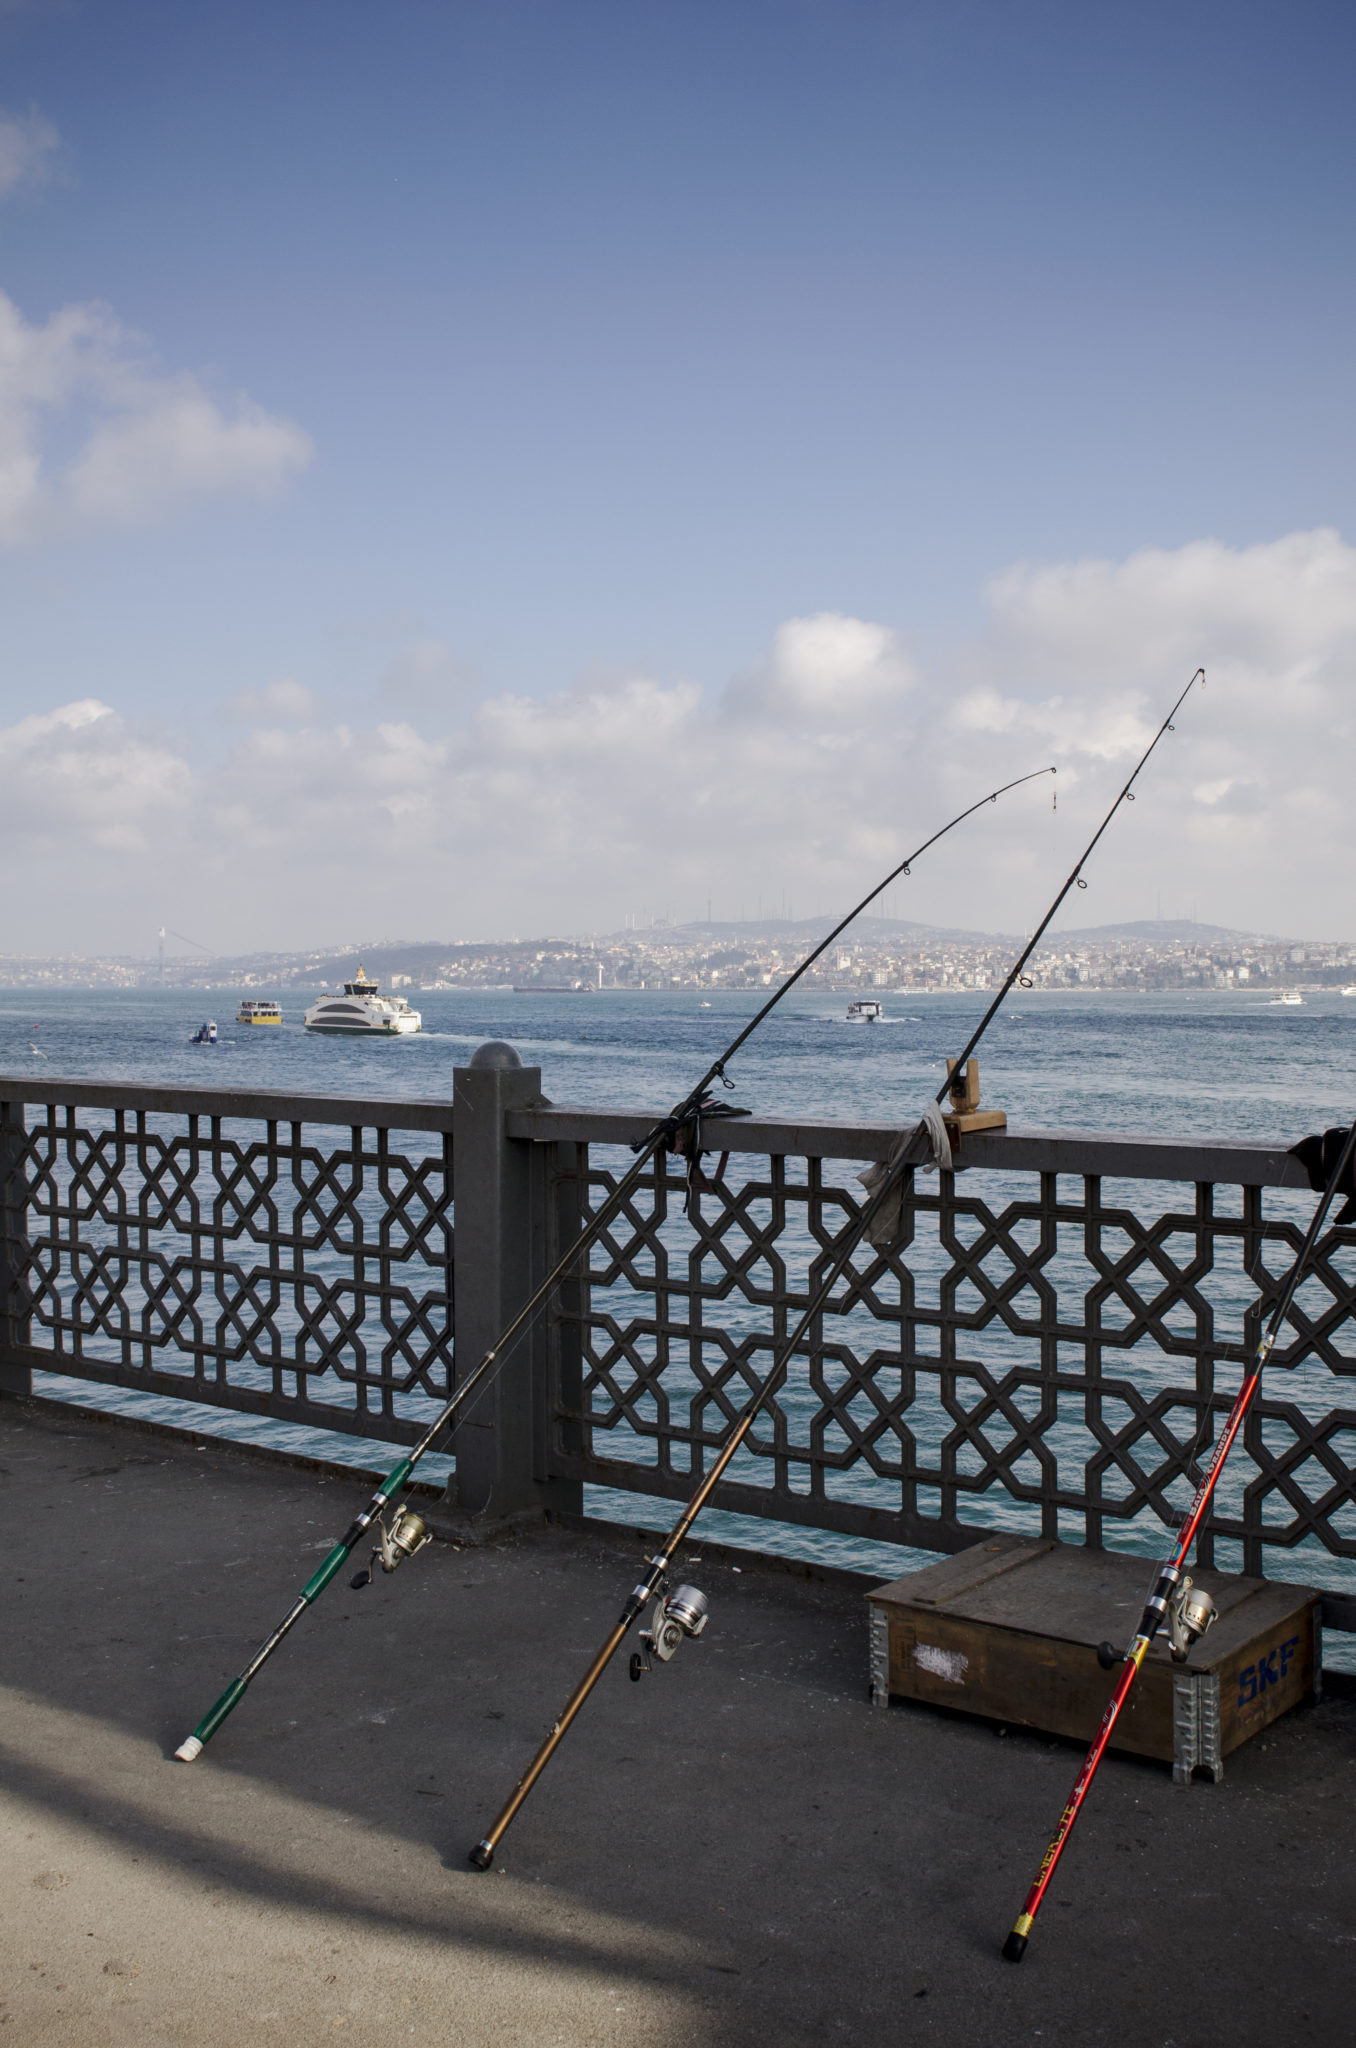 Angler auf der Galata-Brücke in Istanbul